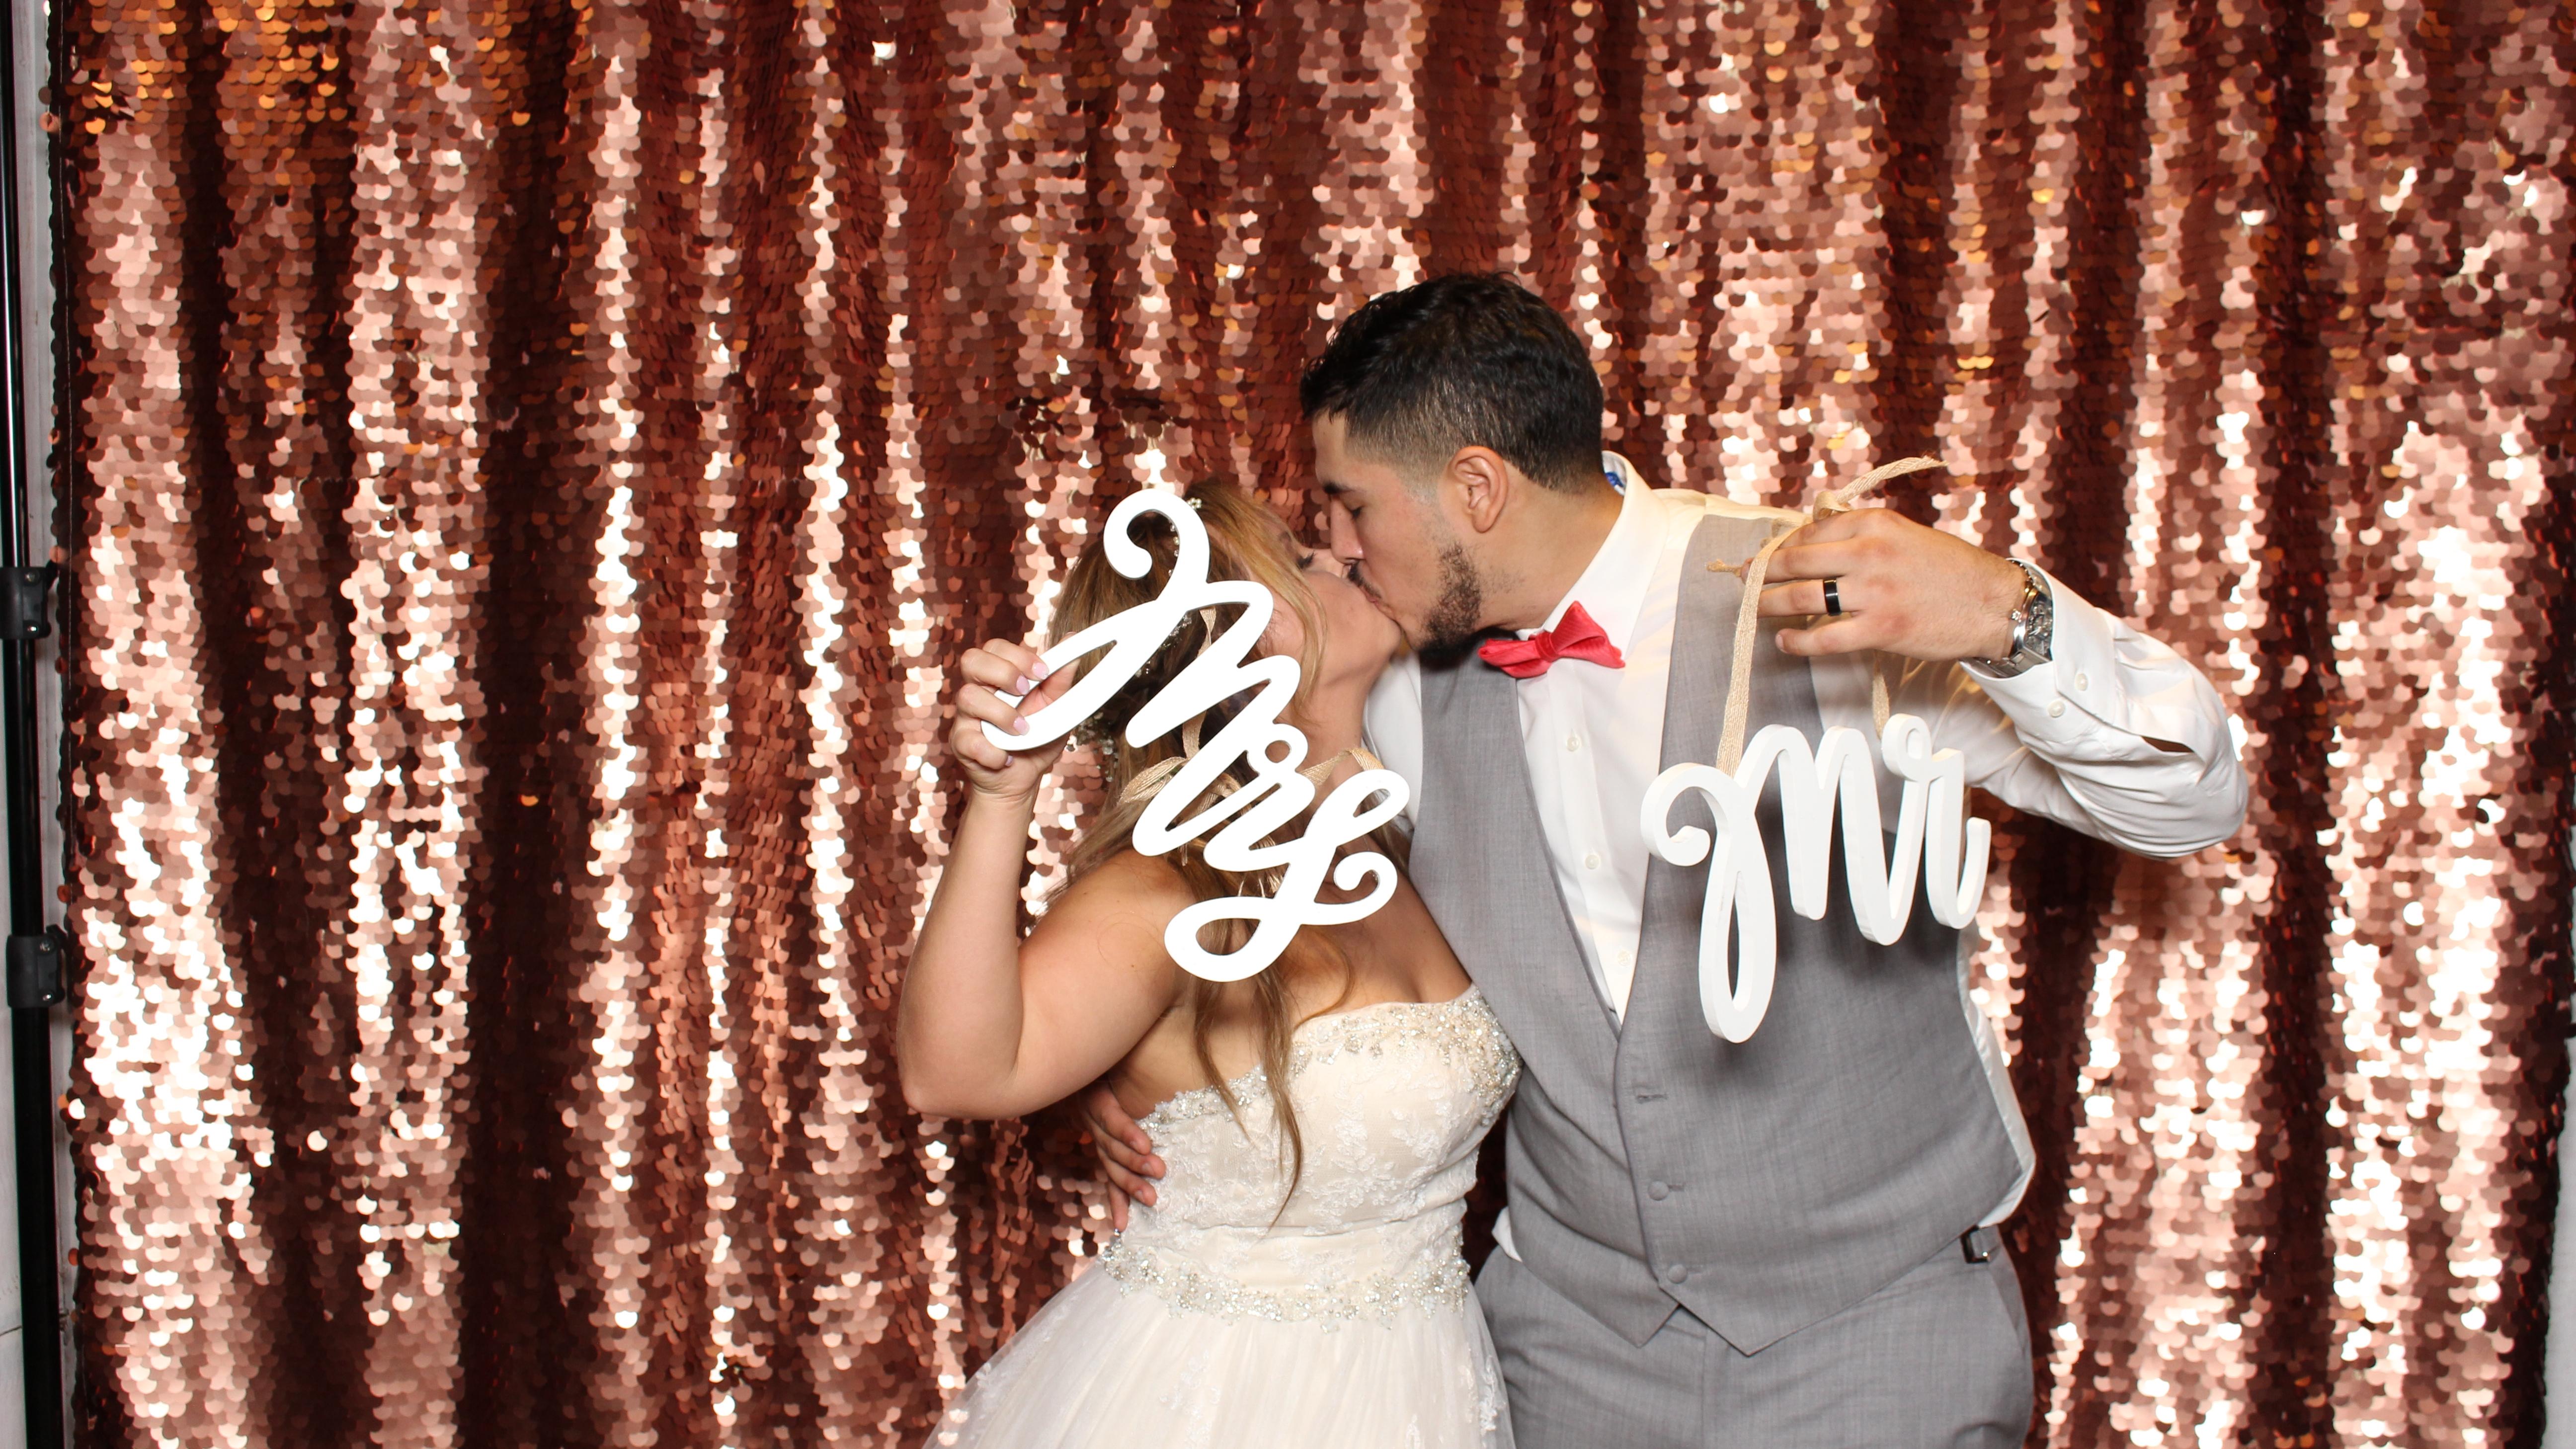 Wedding2018-09-15_19-51-51_2